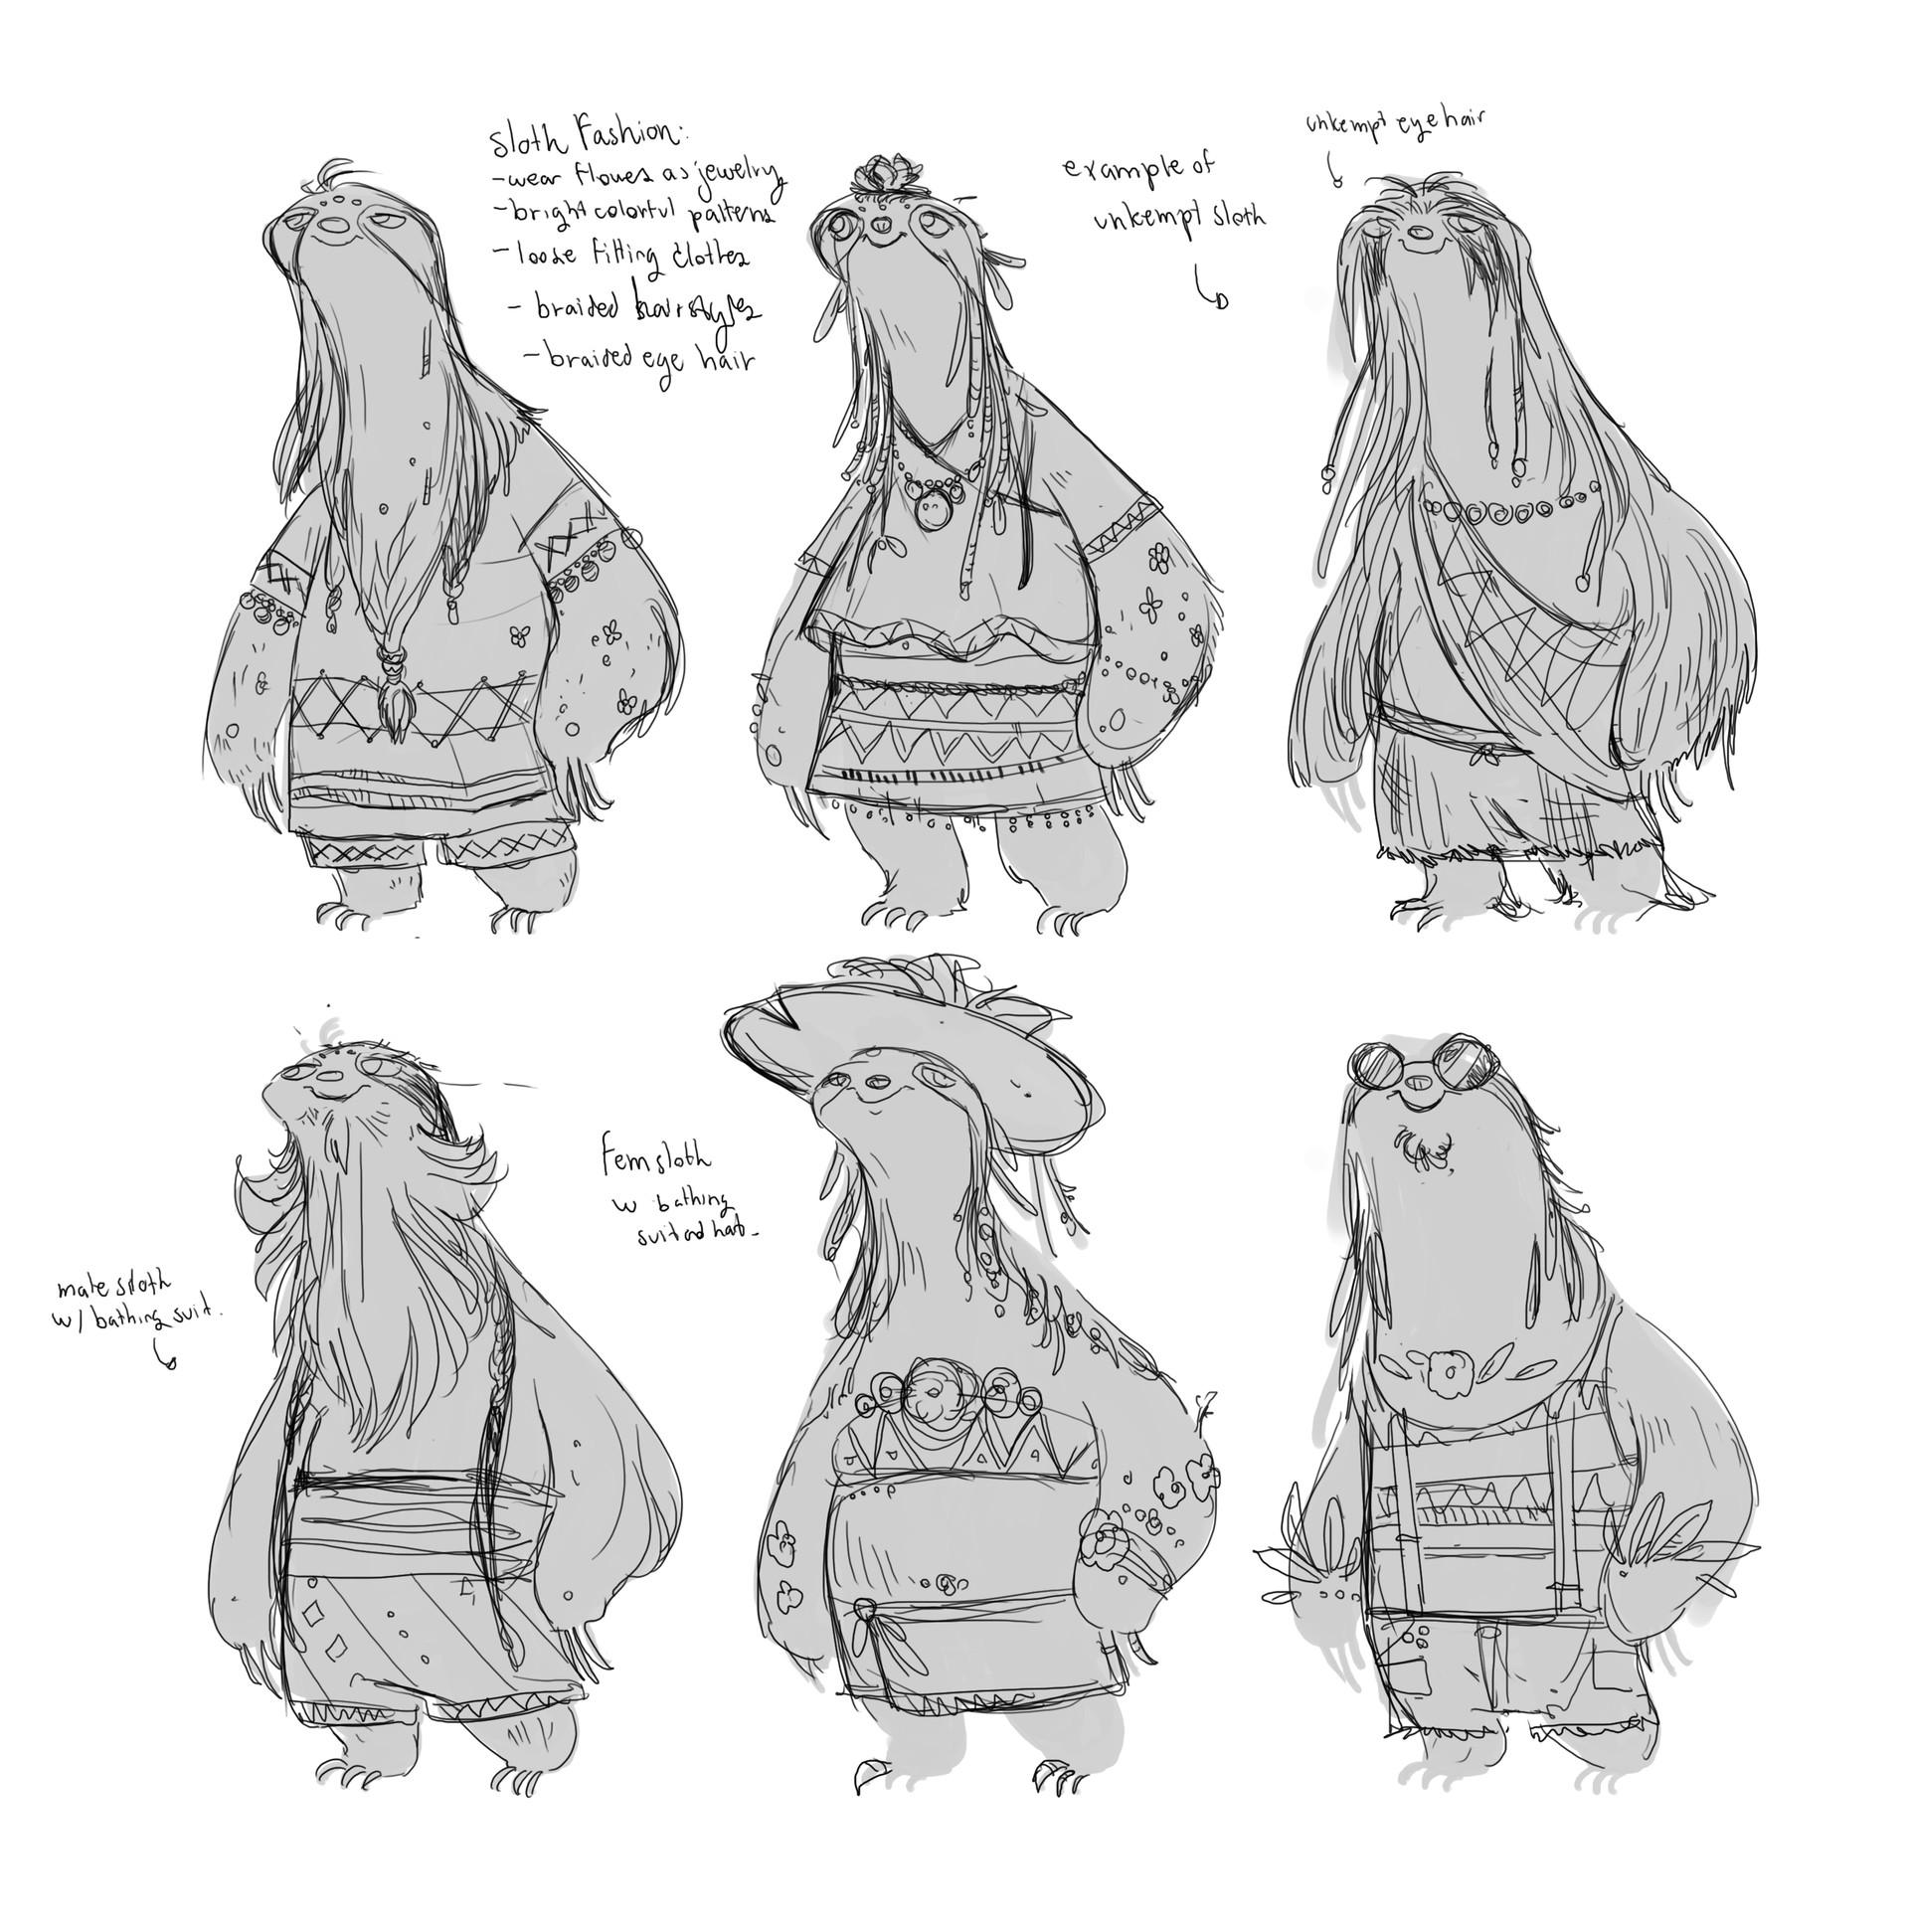 Stef tastan sloths2 cropped